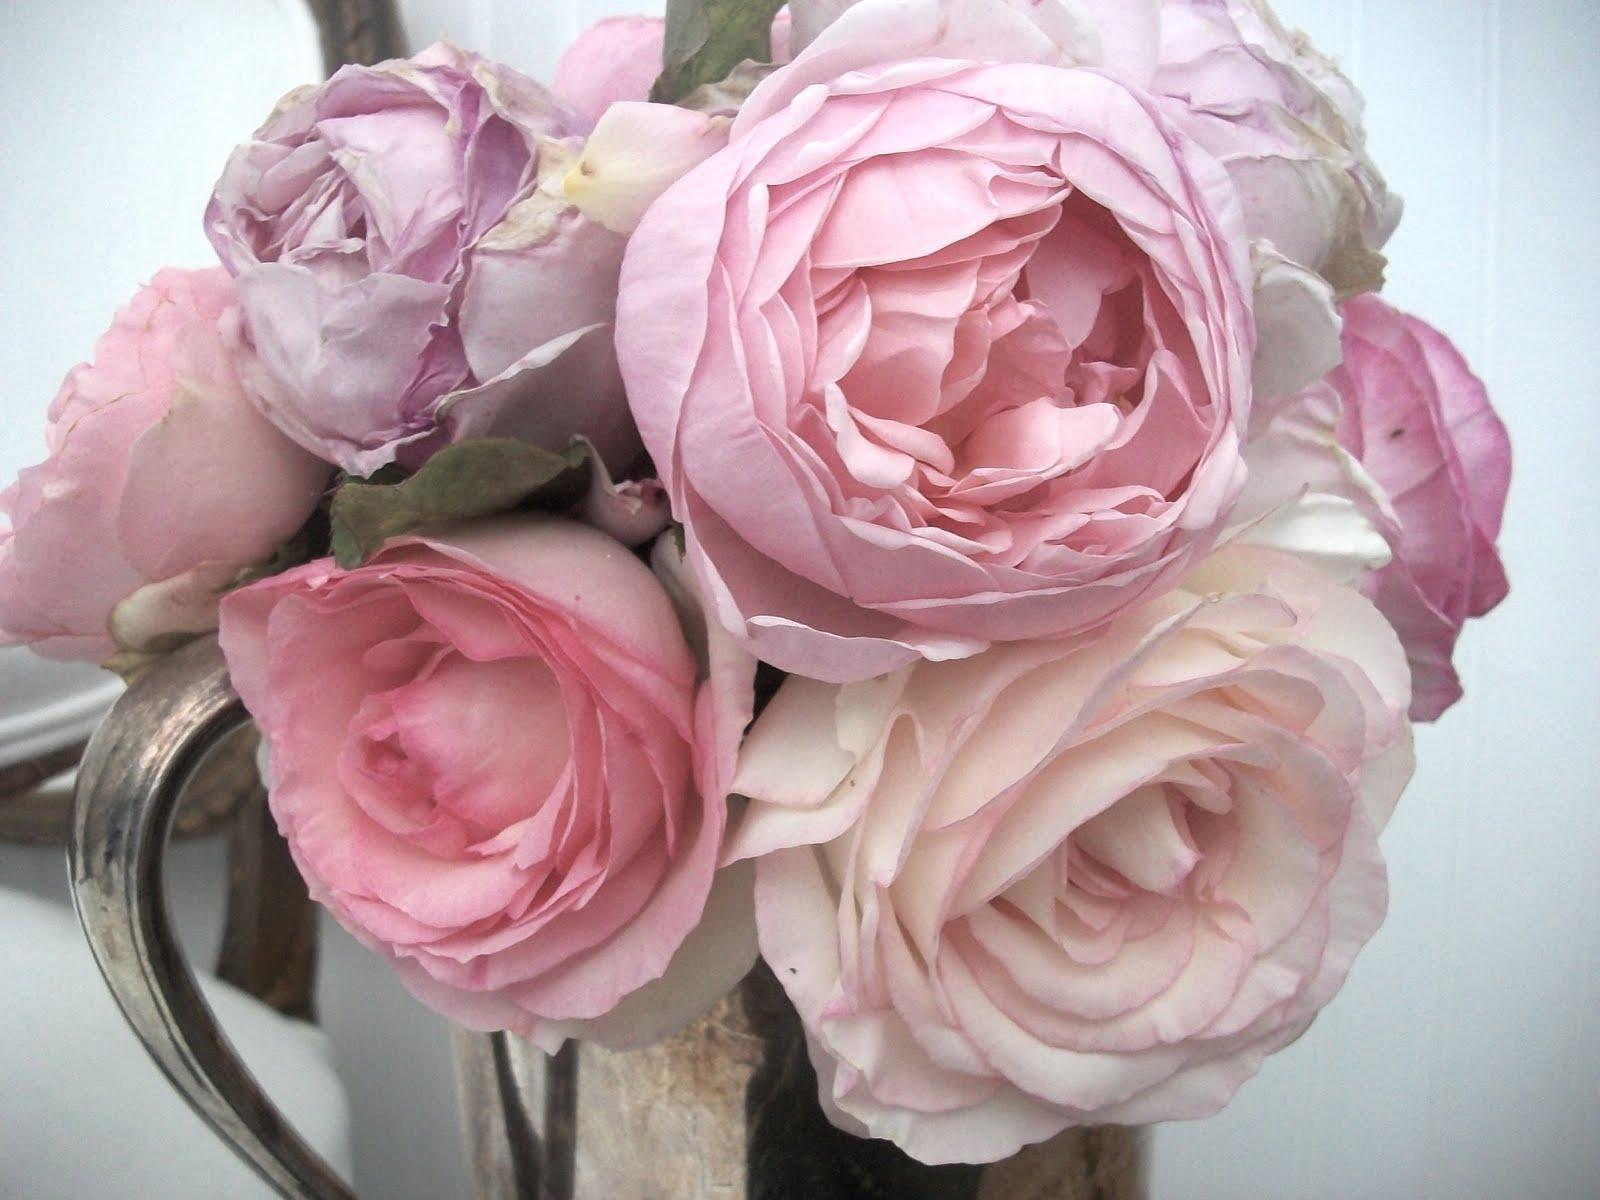 Hd Lavender Wallpaper Full Bloom Cottage Roses Roses Everywhere